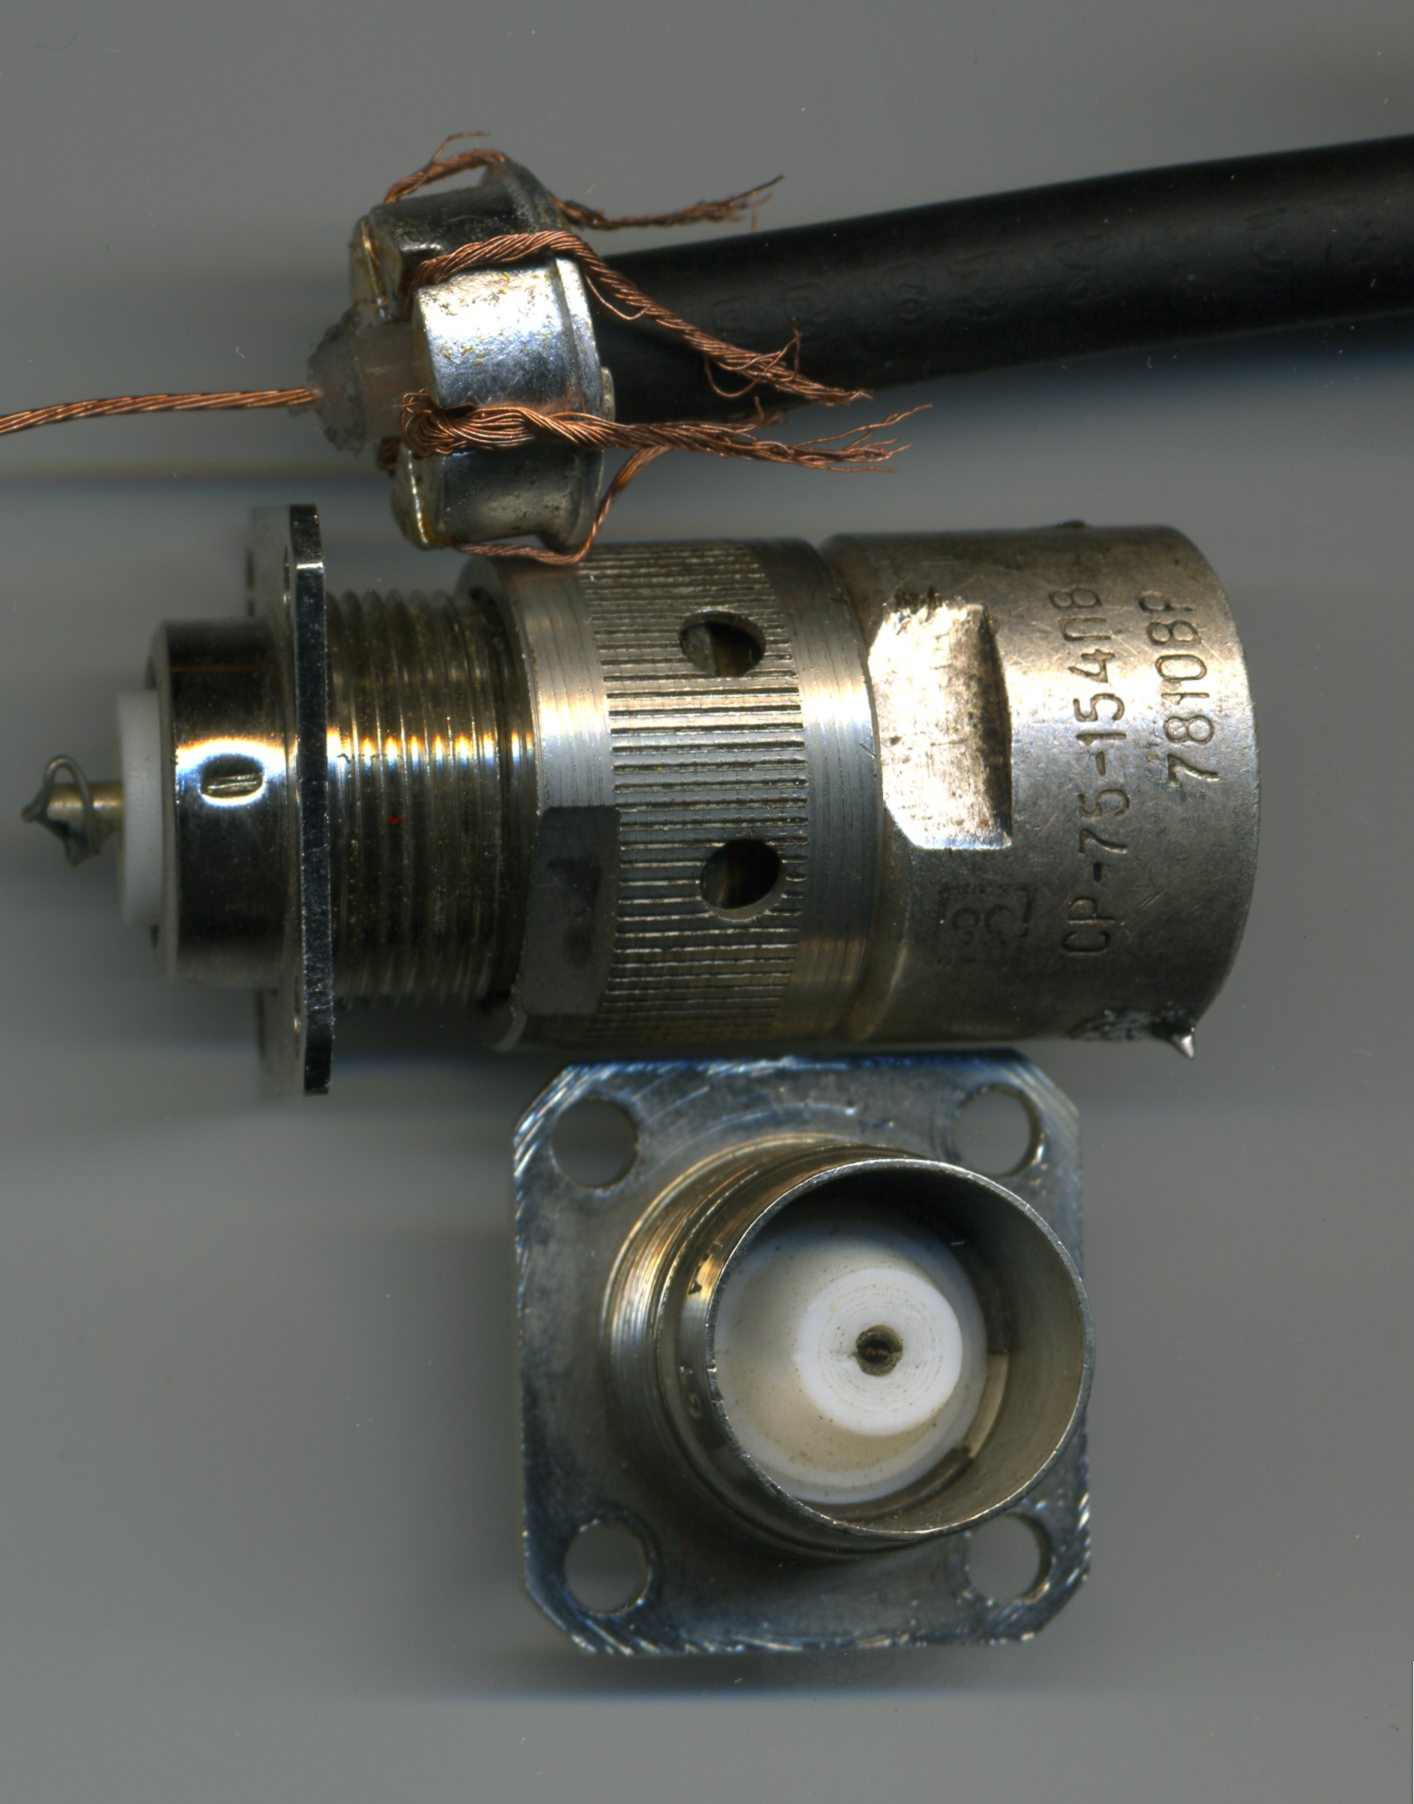 кабель трв 2 0.4